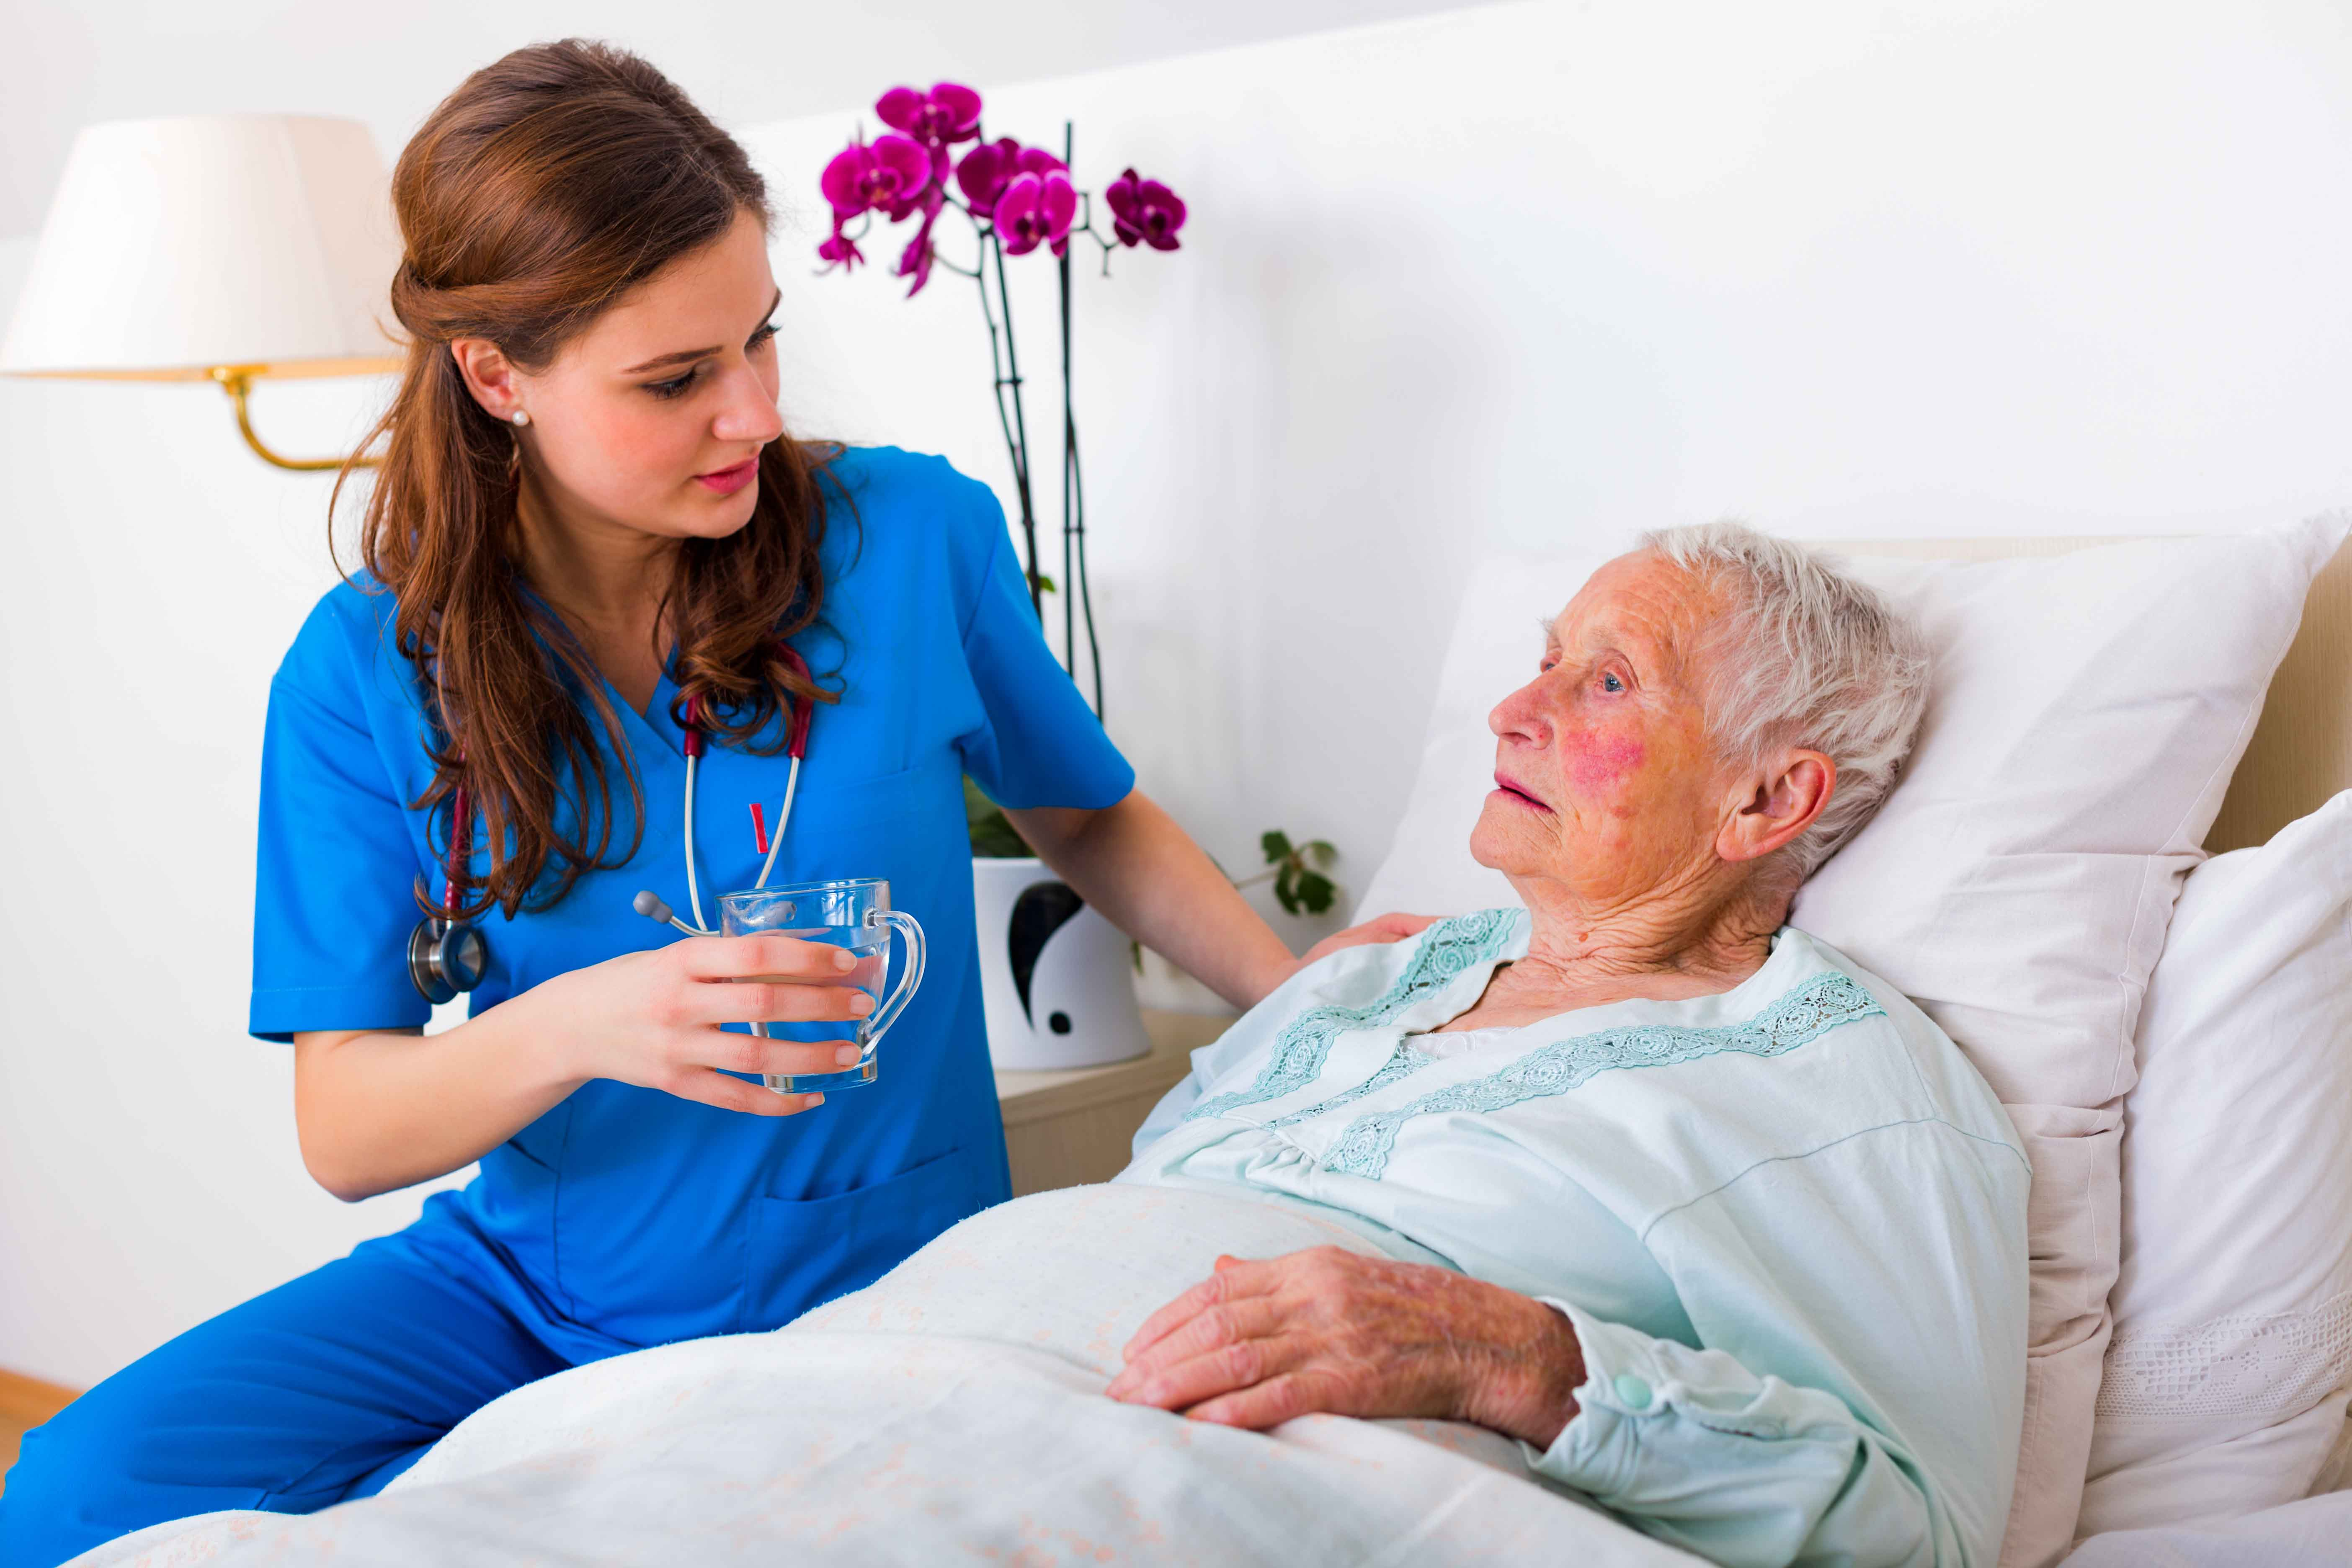 Sanitaria atendiendo a persona mayor con Alzheimer